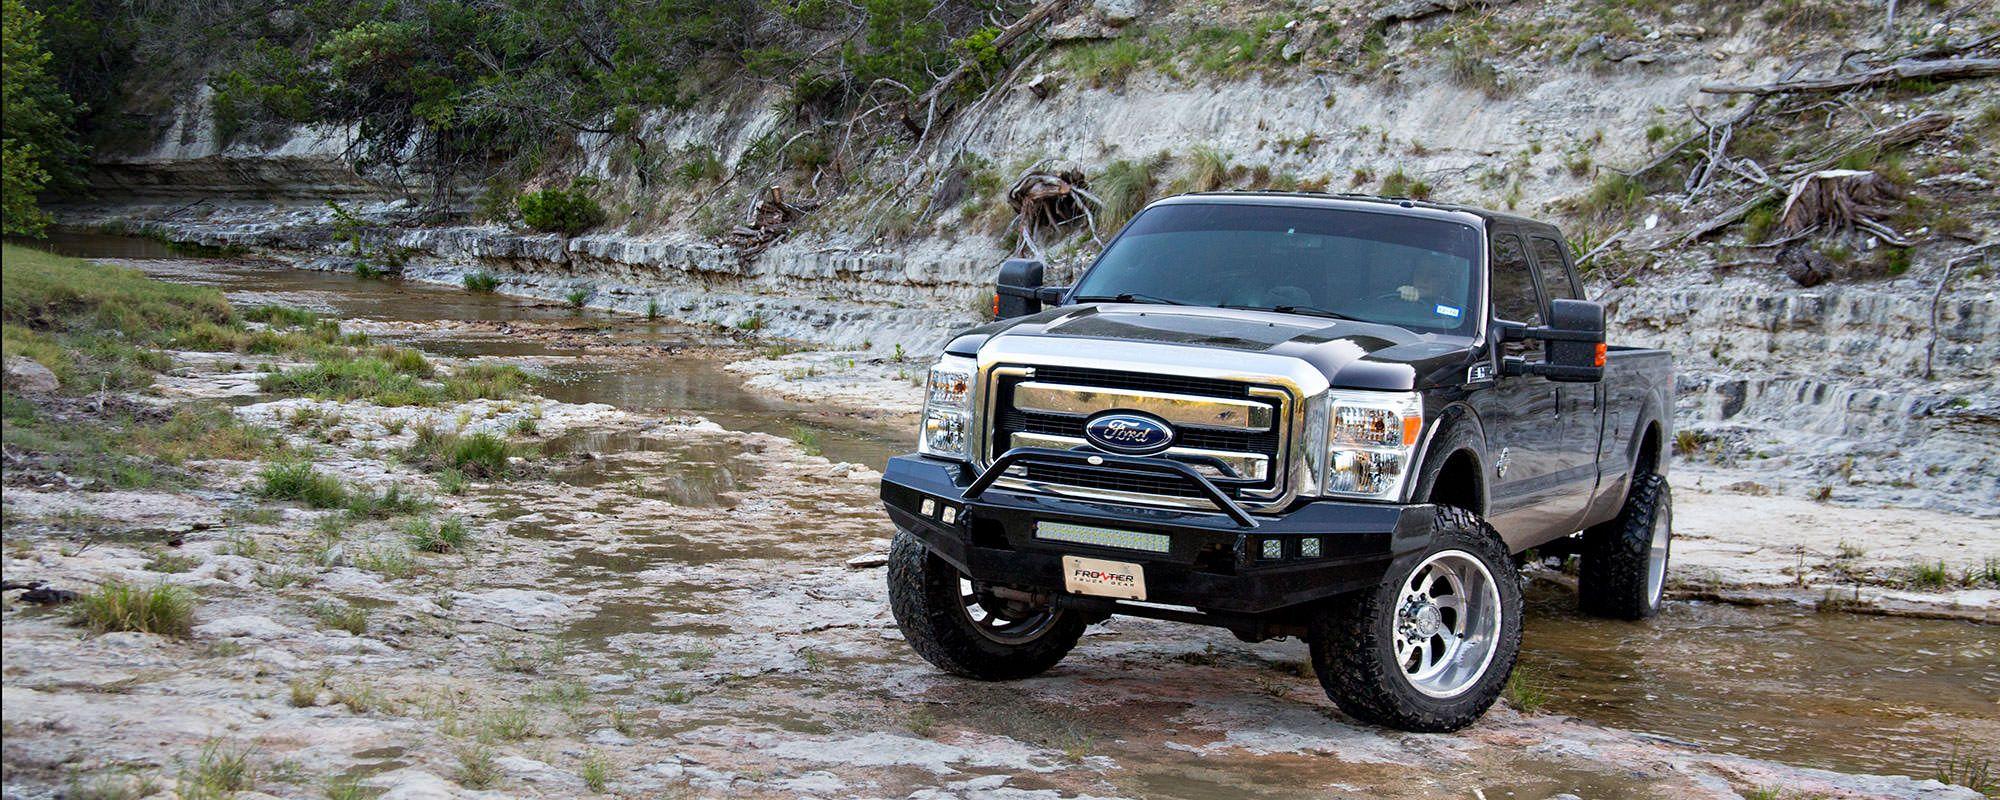 Truck Accessories Ford F150 Truck accessories ford